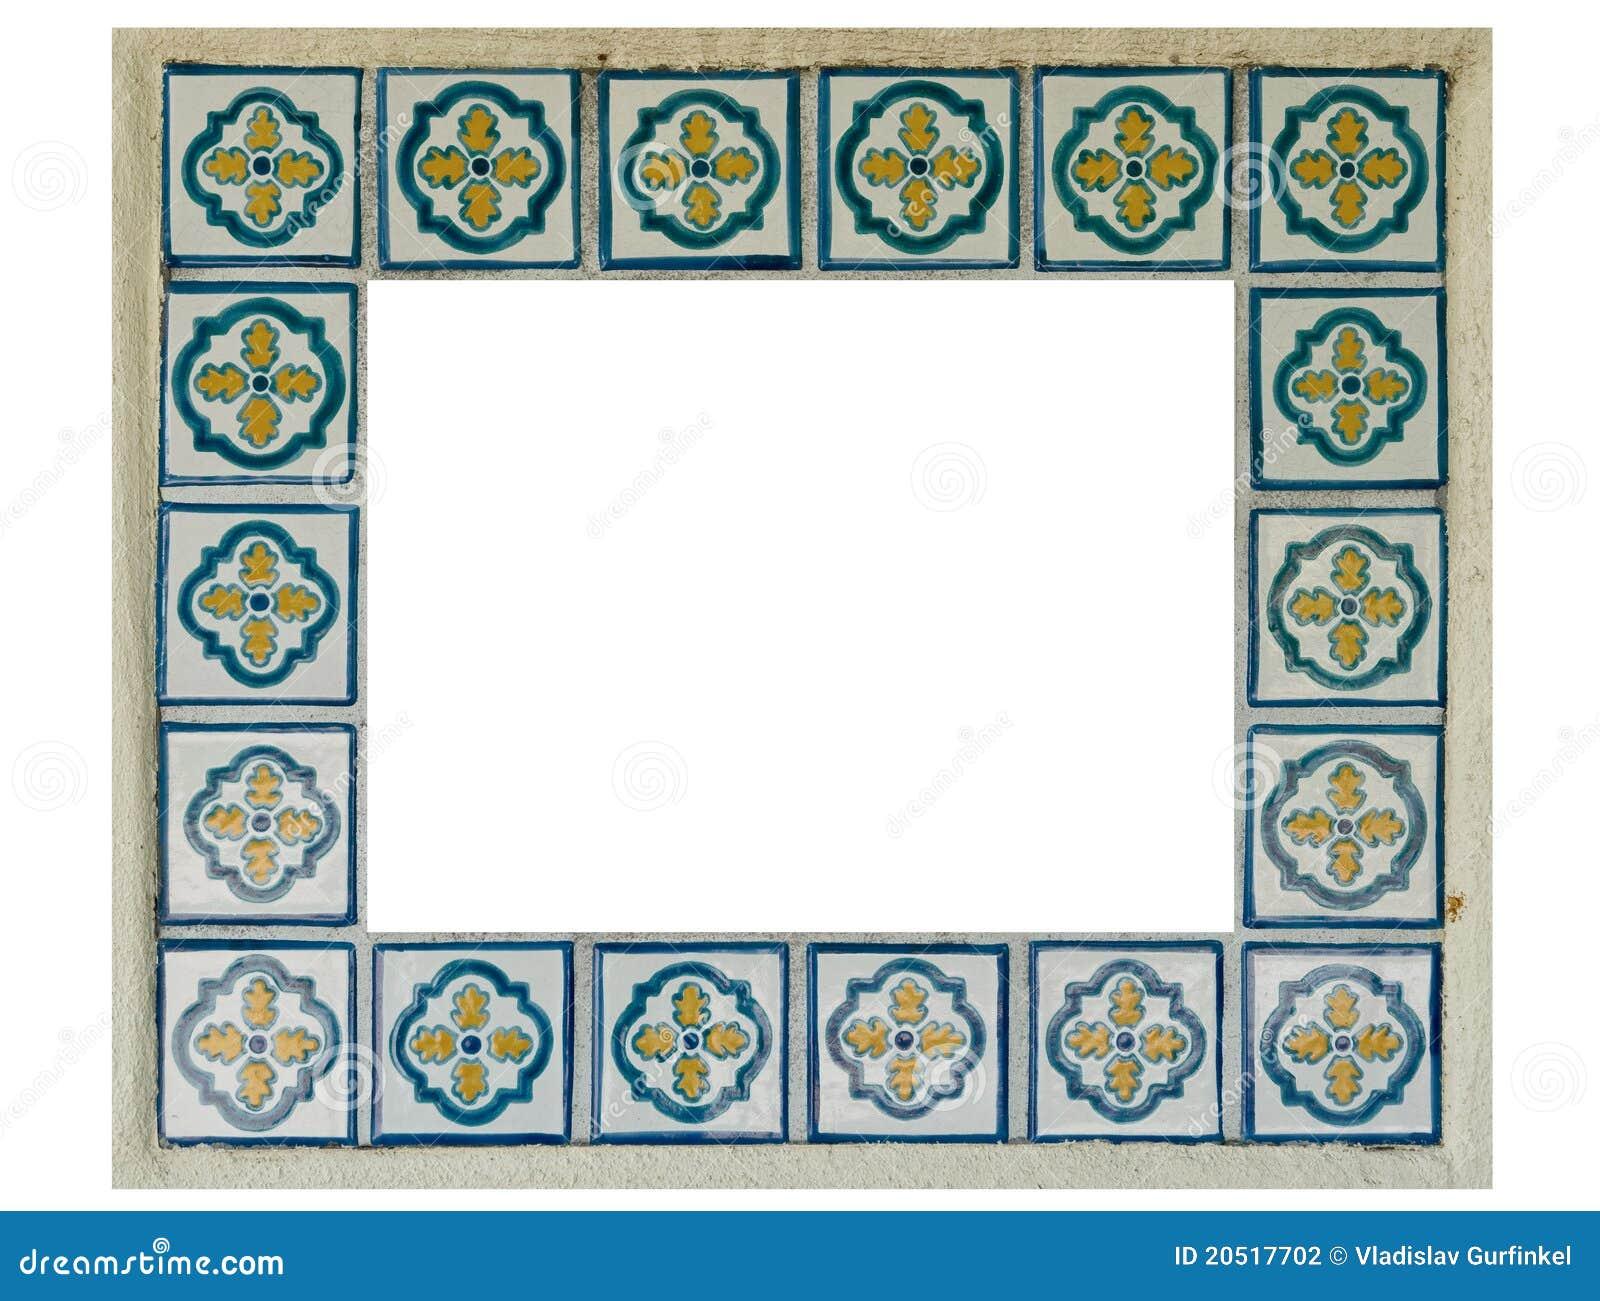 Ceramic tiles frame stock photo. Image of spanish, textures - 20517702